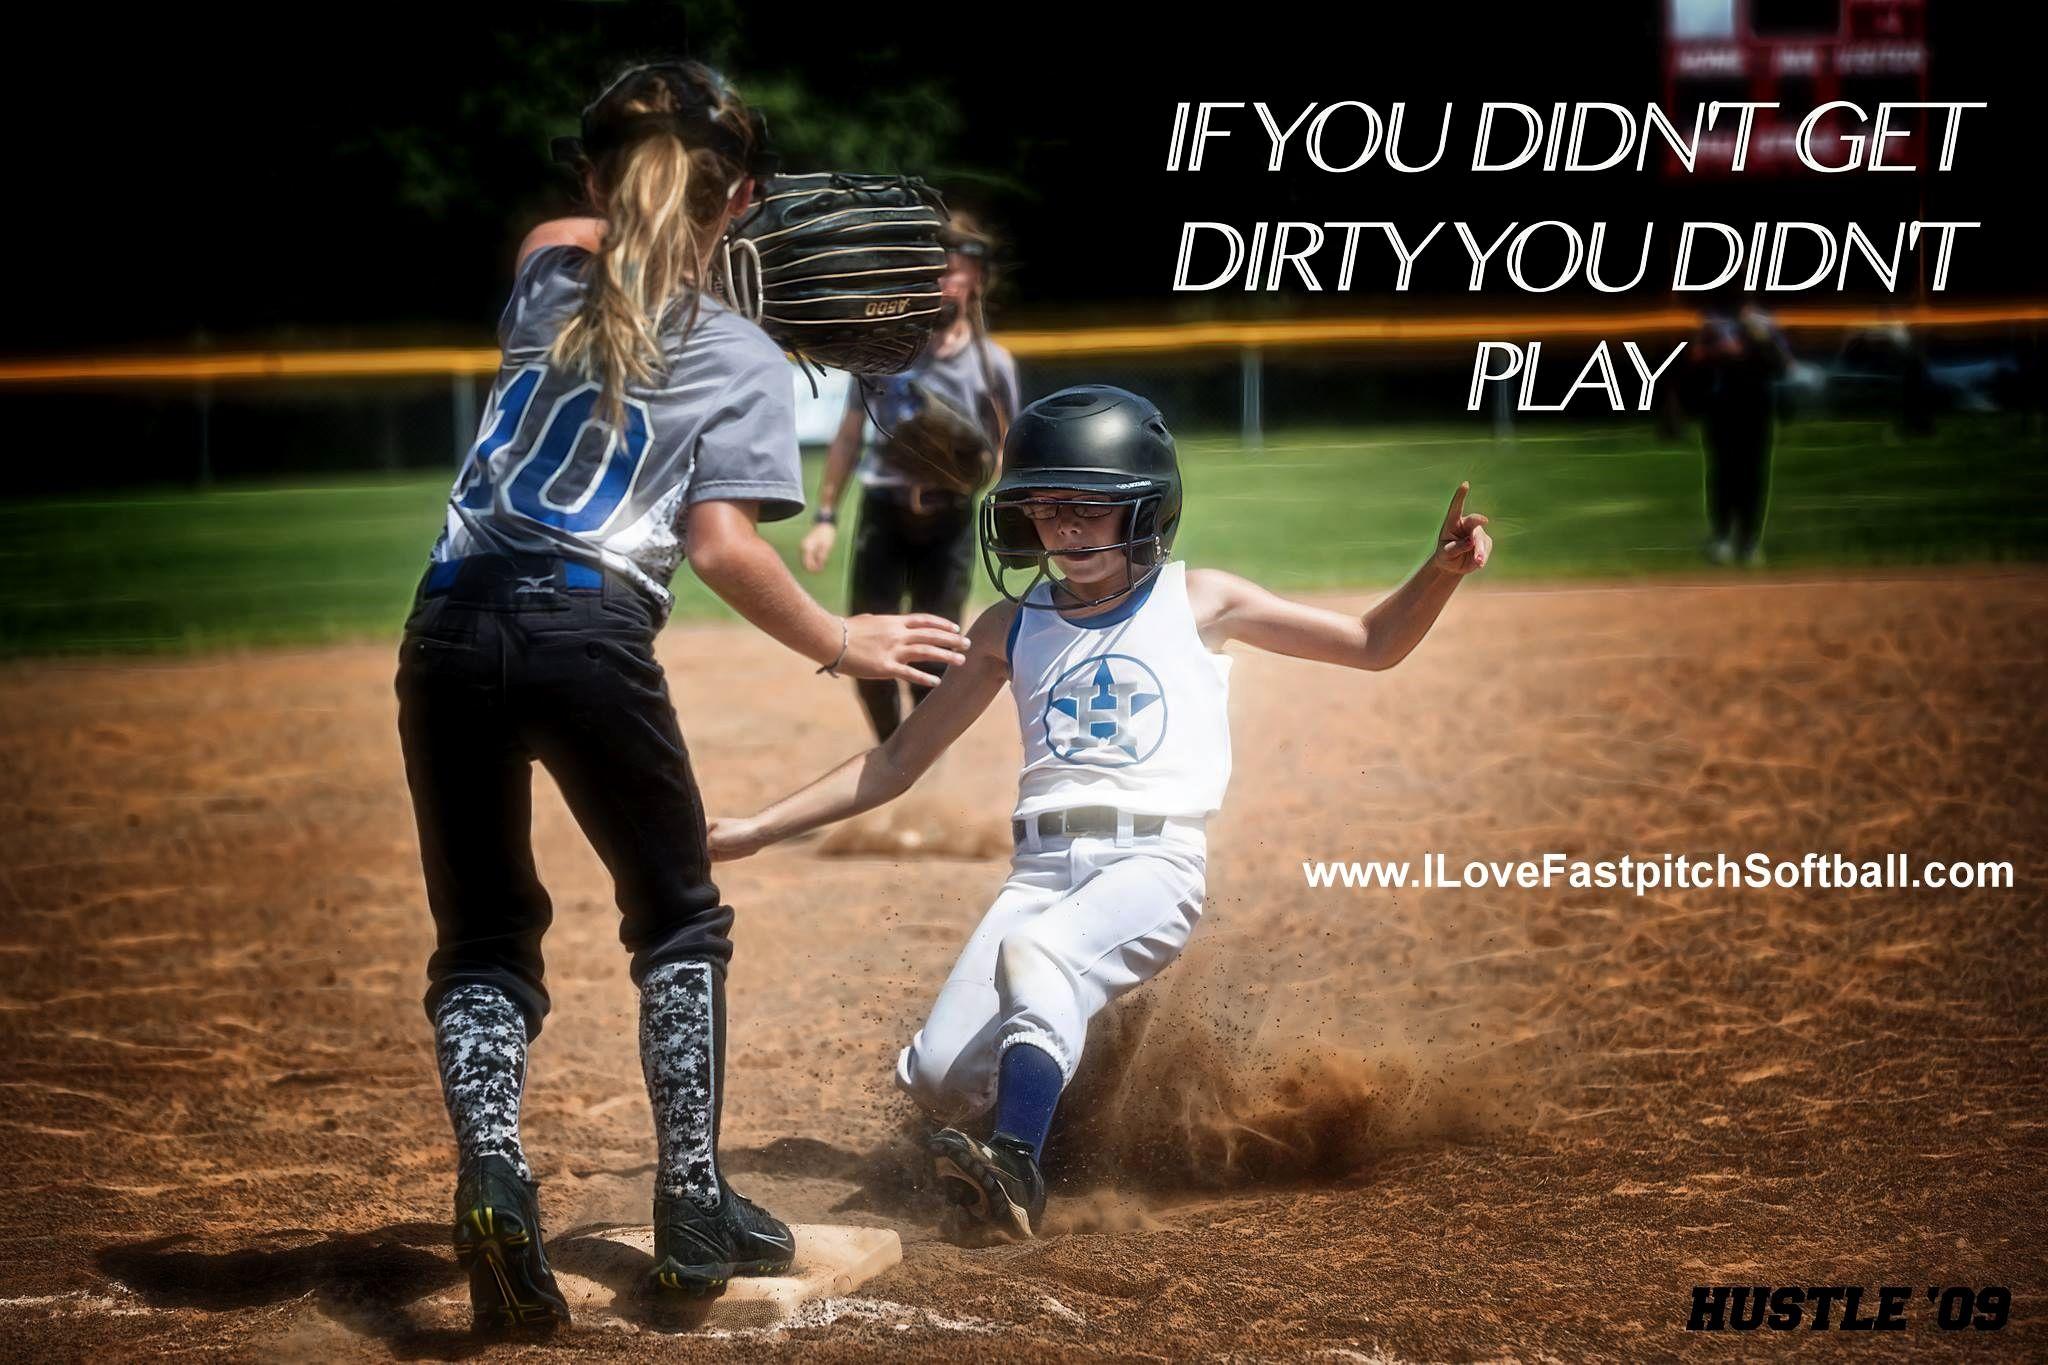 Get Dirty Fanmeme Softballmeme Ilovefastpitchsoftball